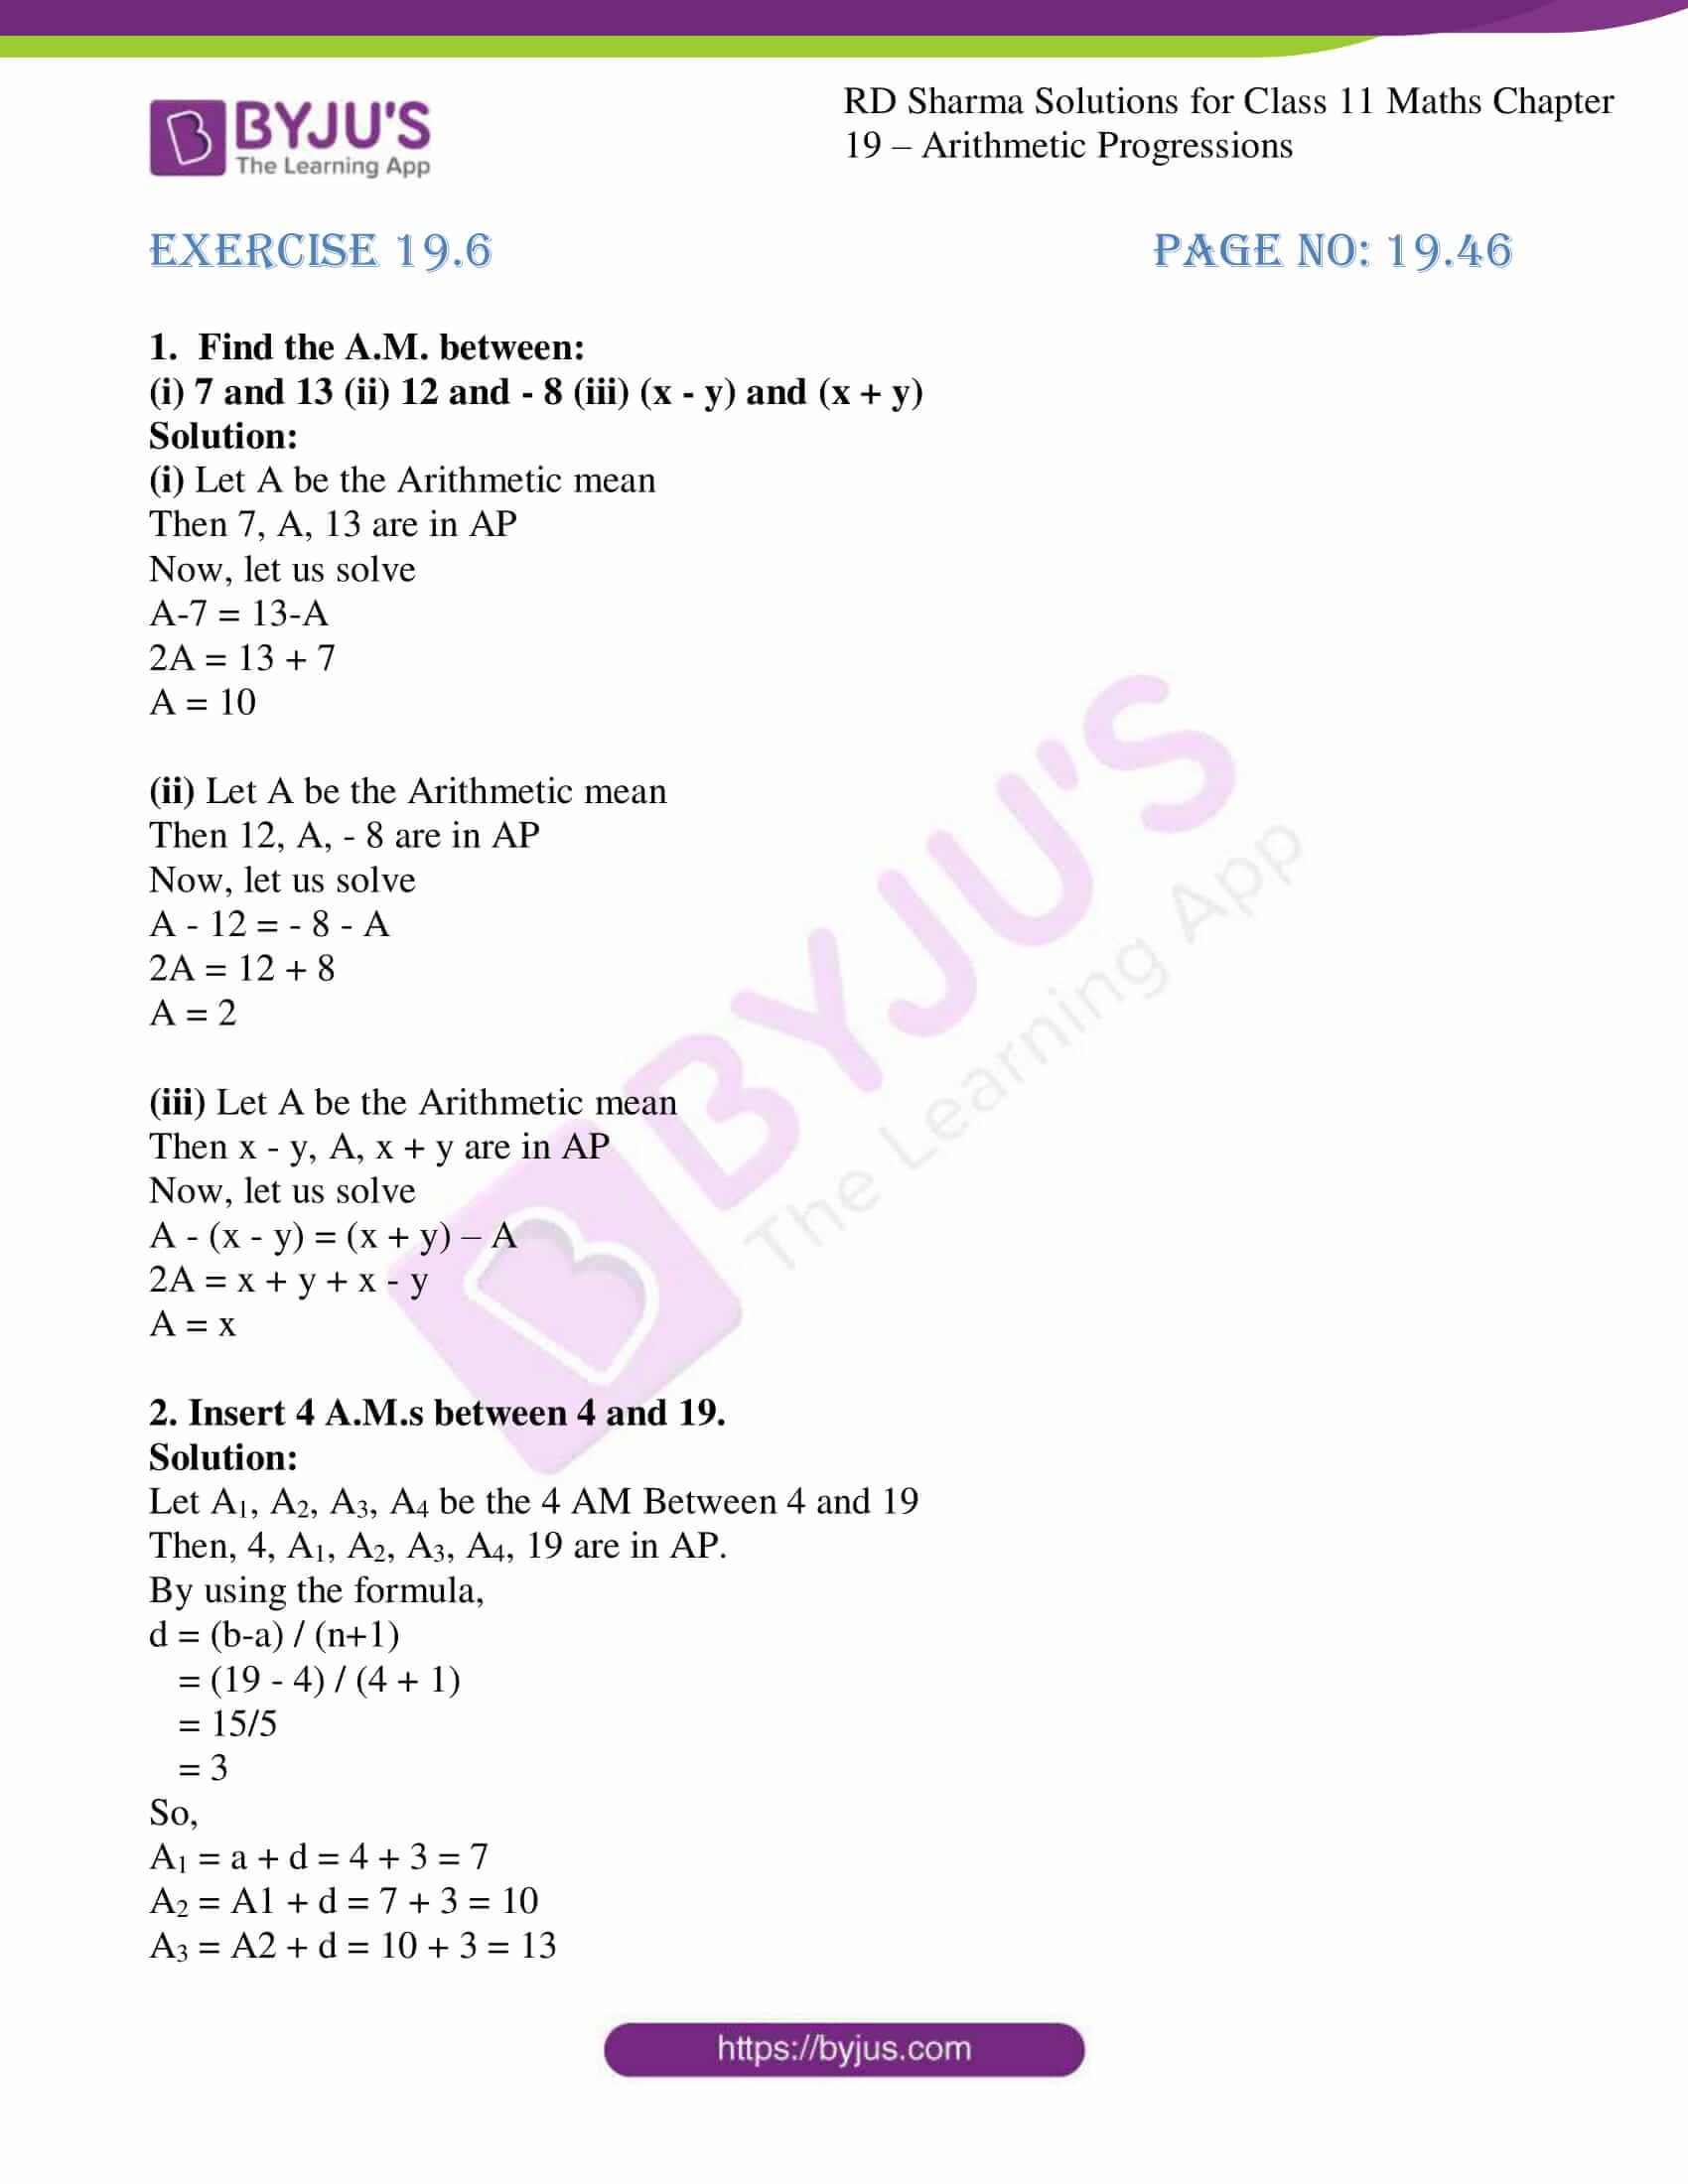 rd sharma class 11 maths ch 19 ex 6 1